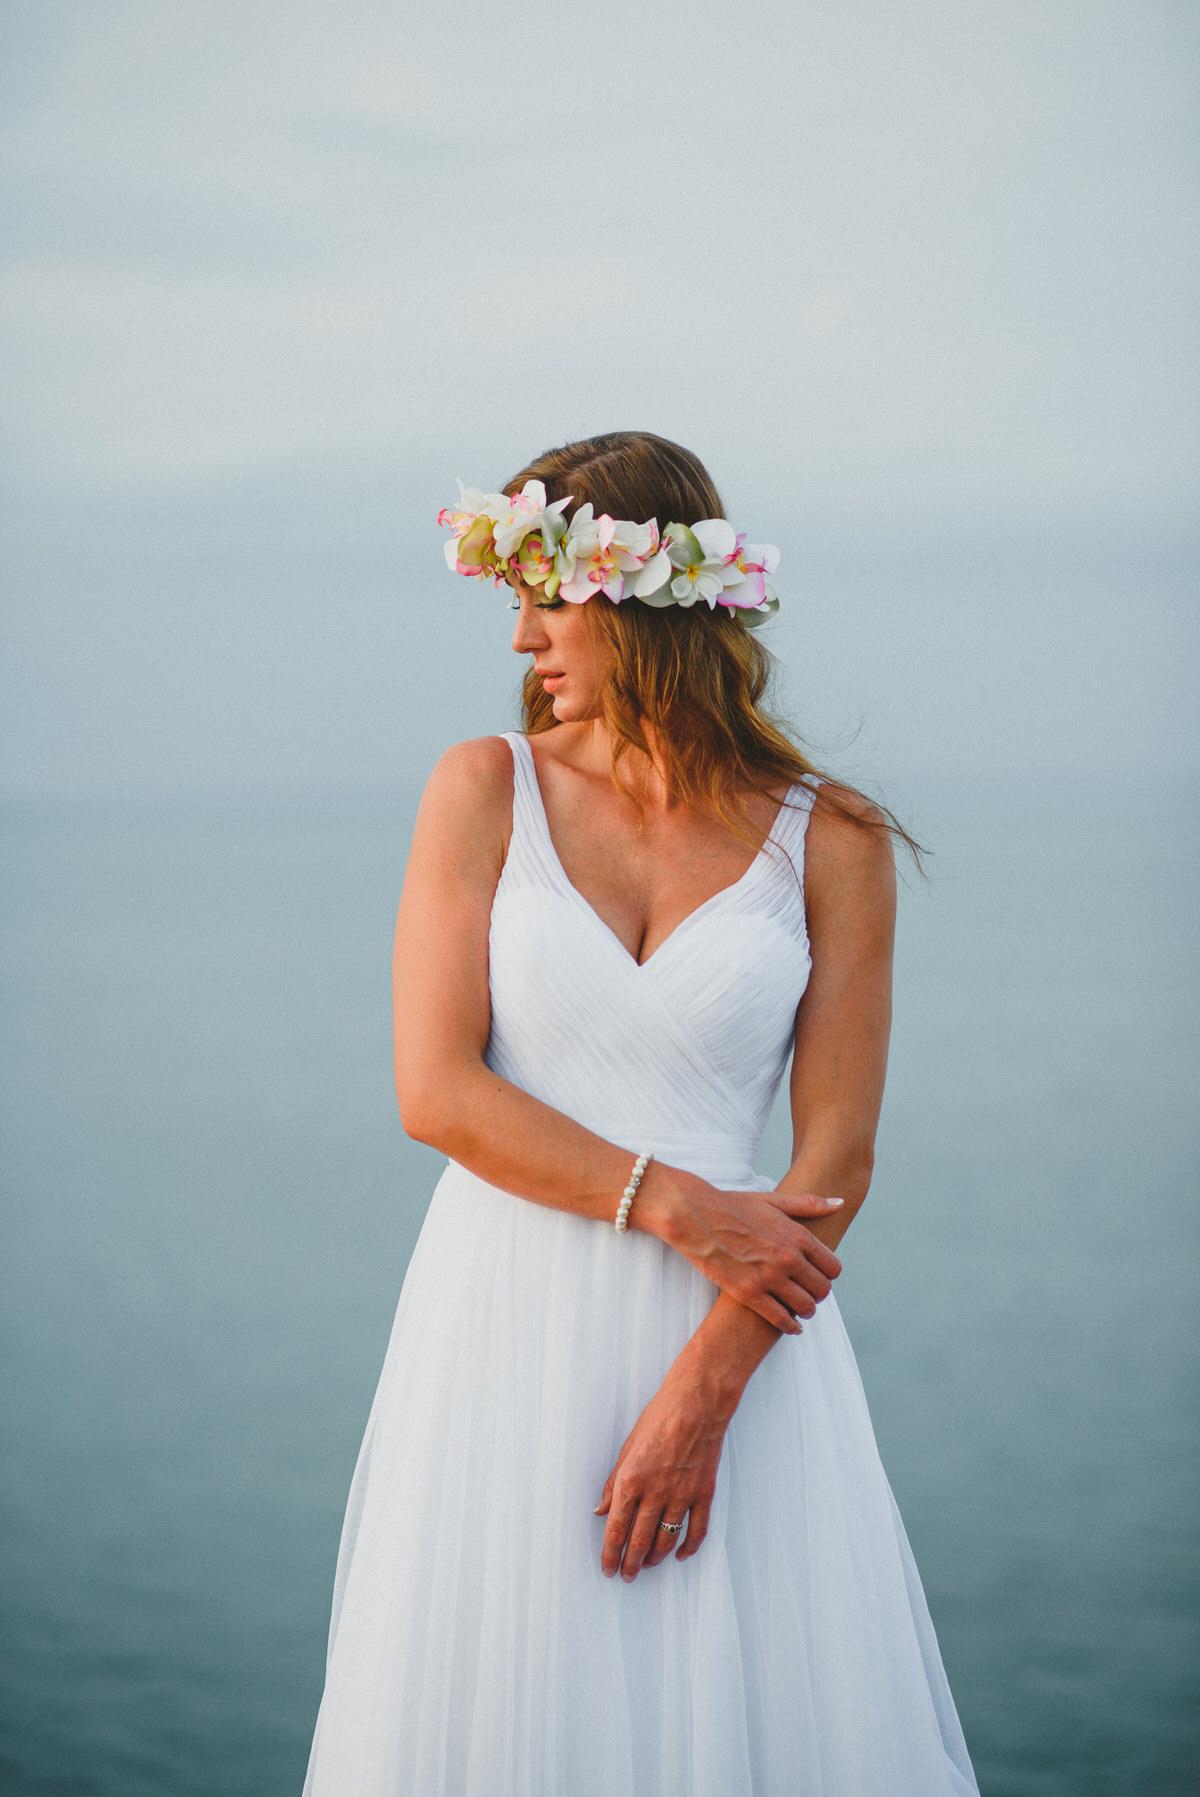 bali wedding destination-wedding in bali - bali photographer - bali clift wedding - profesional bali wedding photographer - diktatphotography - M&B wedding - 45